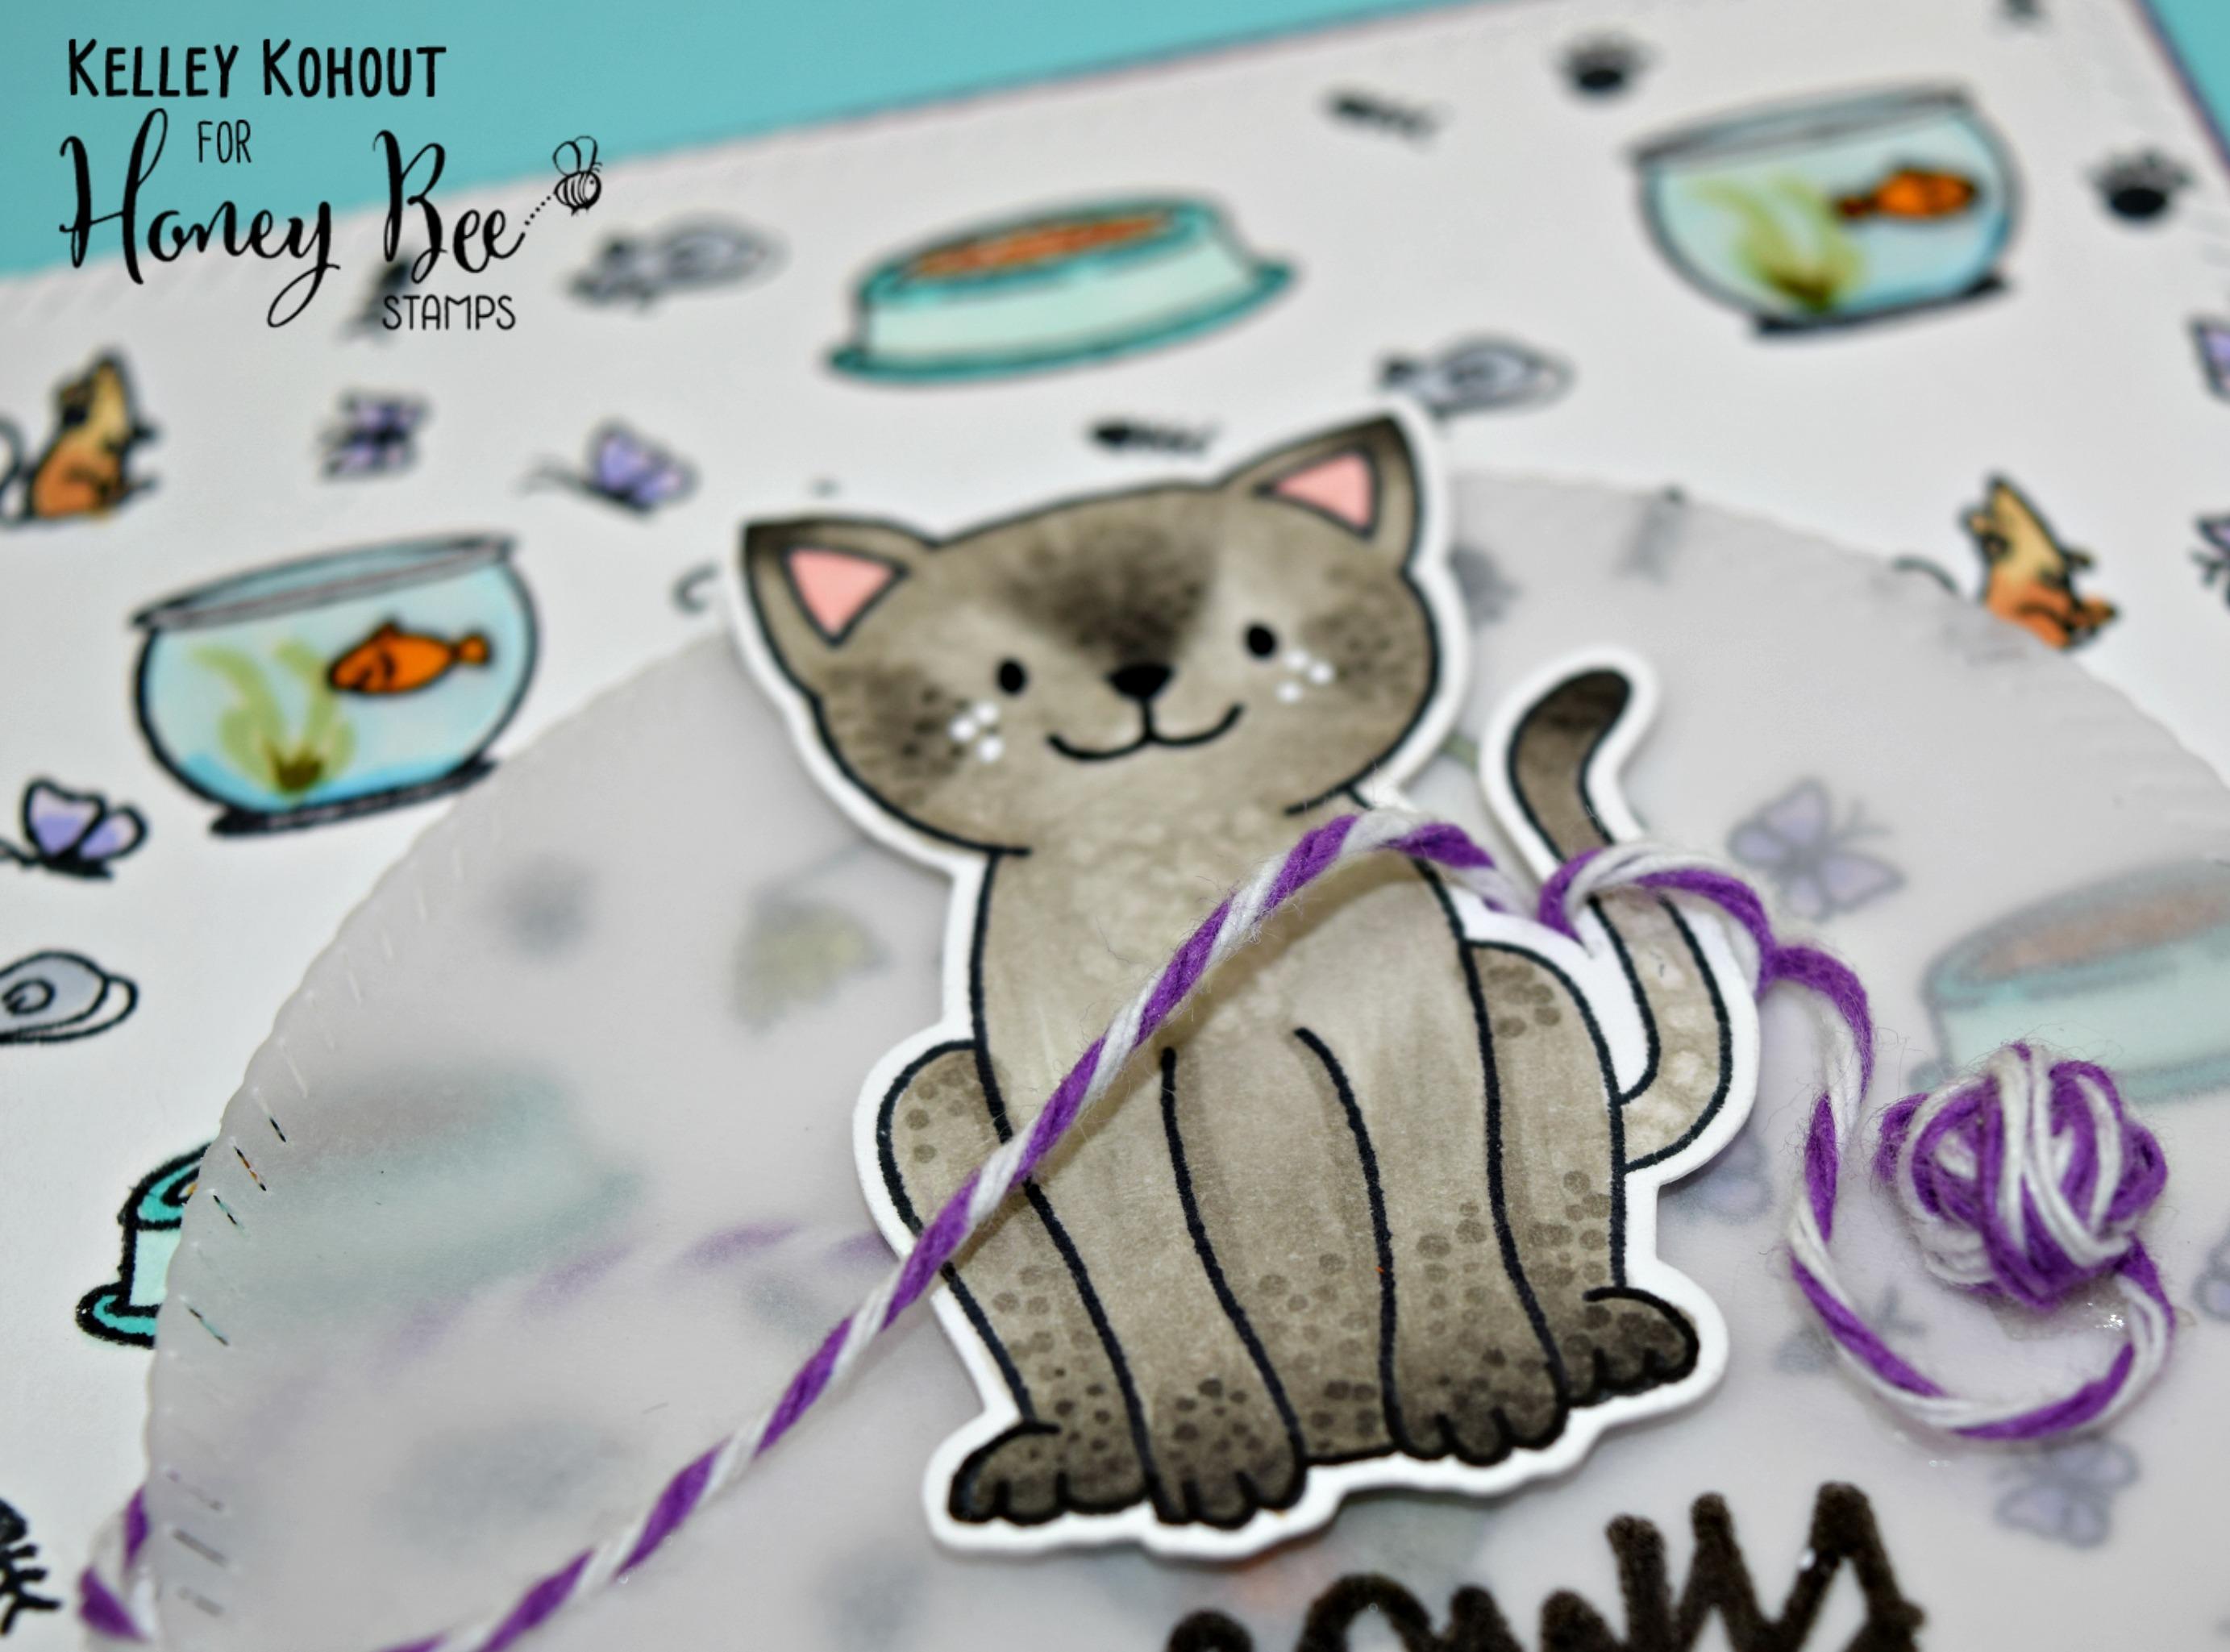 Day 4 Sneak Peek at the Curious Kitties!